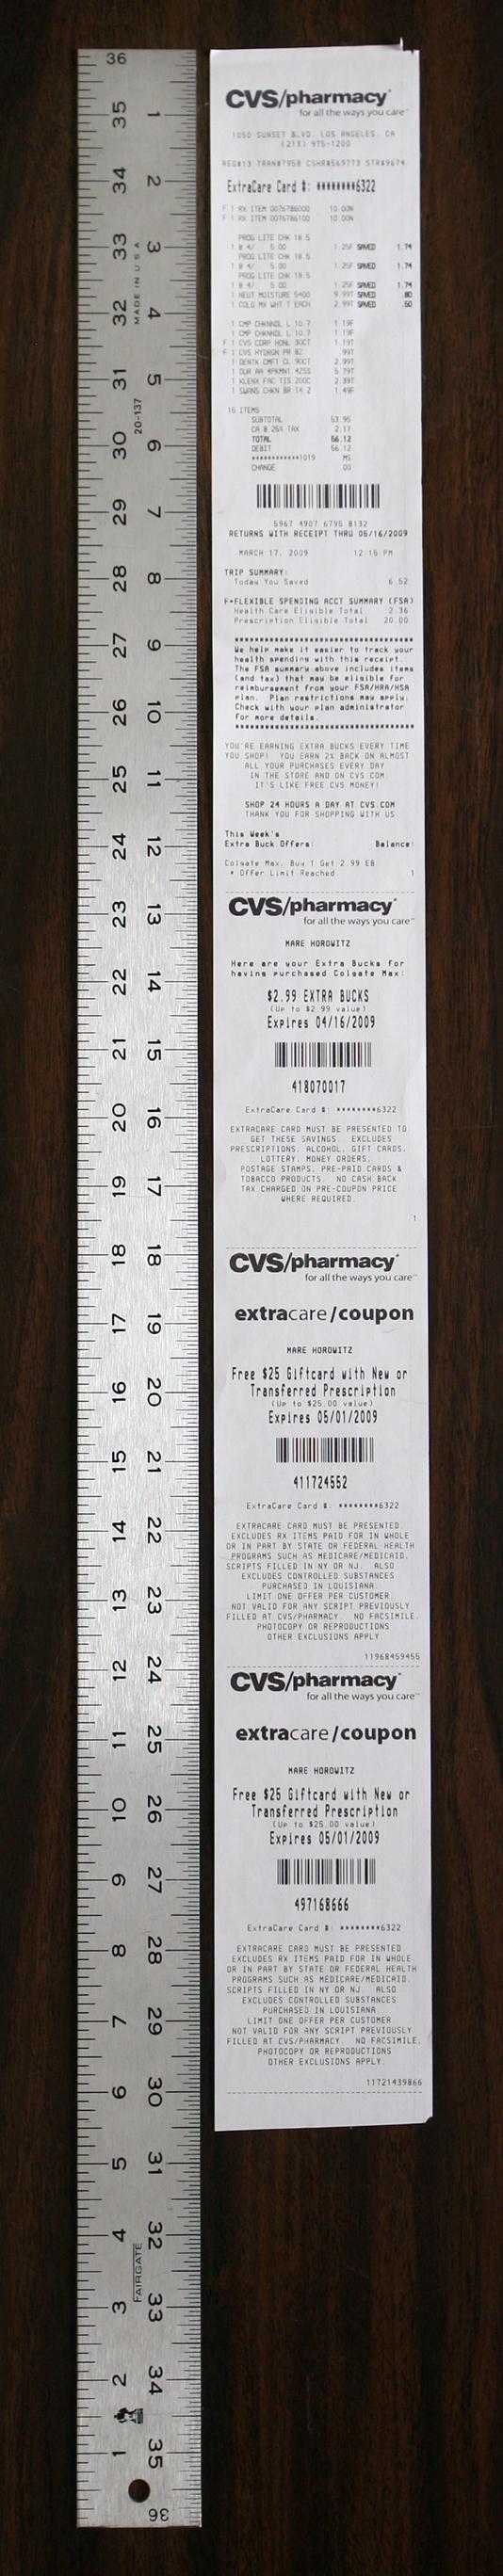 longest receipt ever